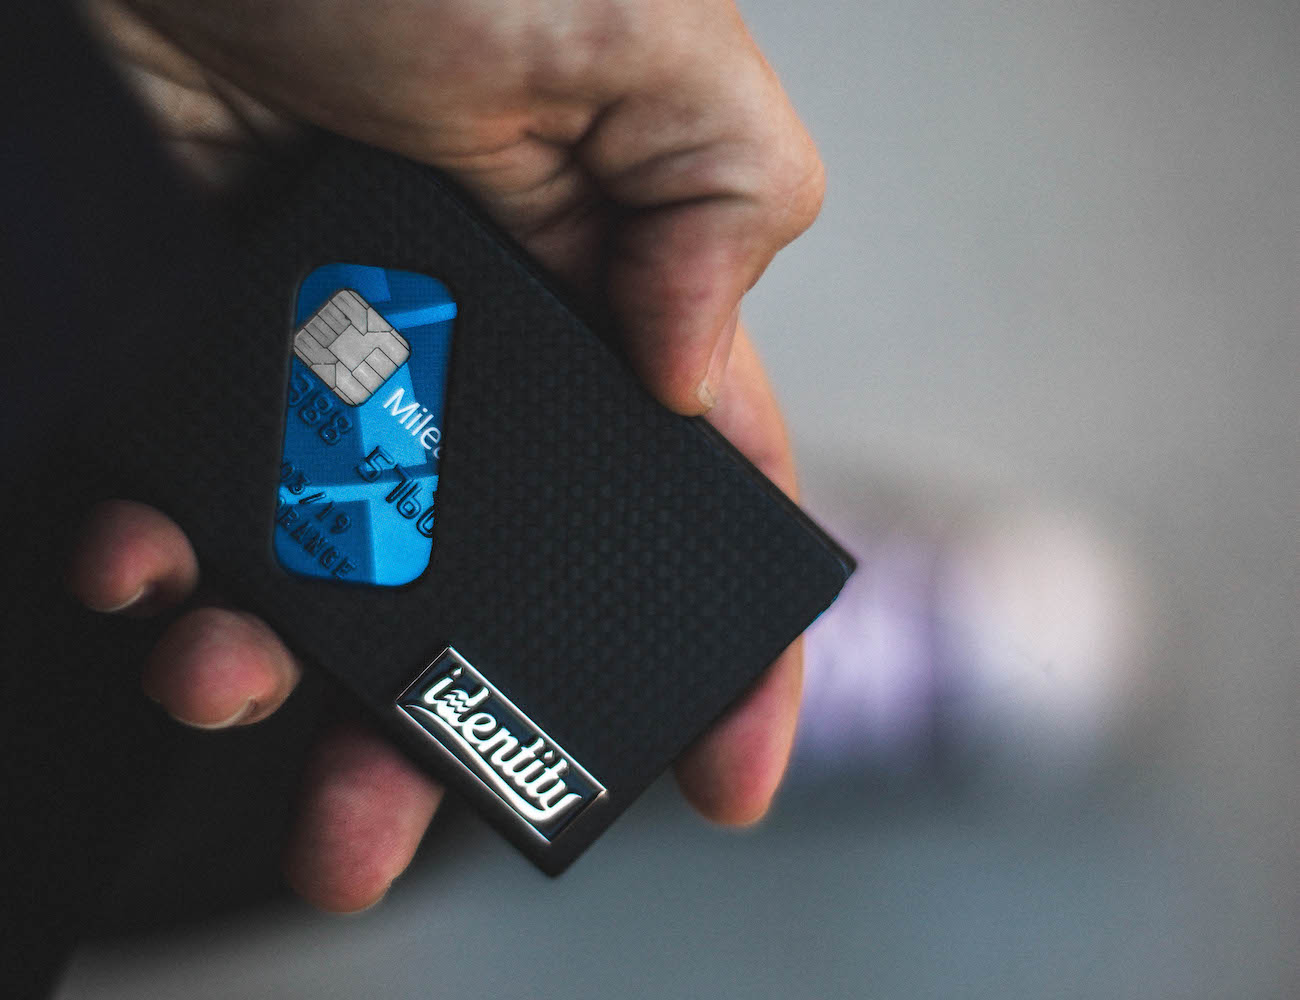 IDENTITY Card Wallet